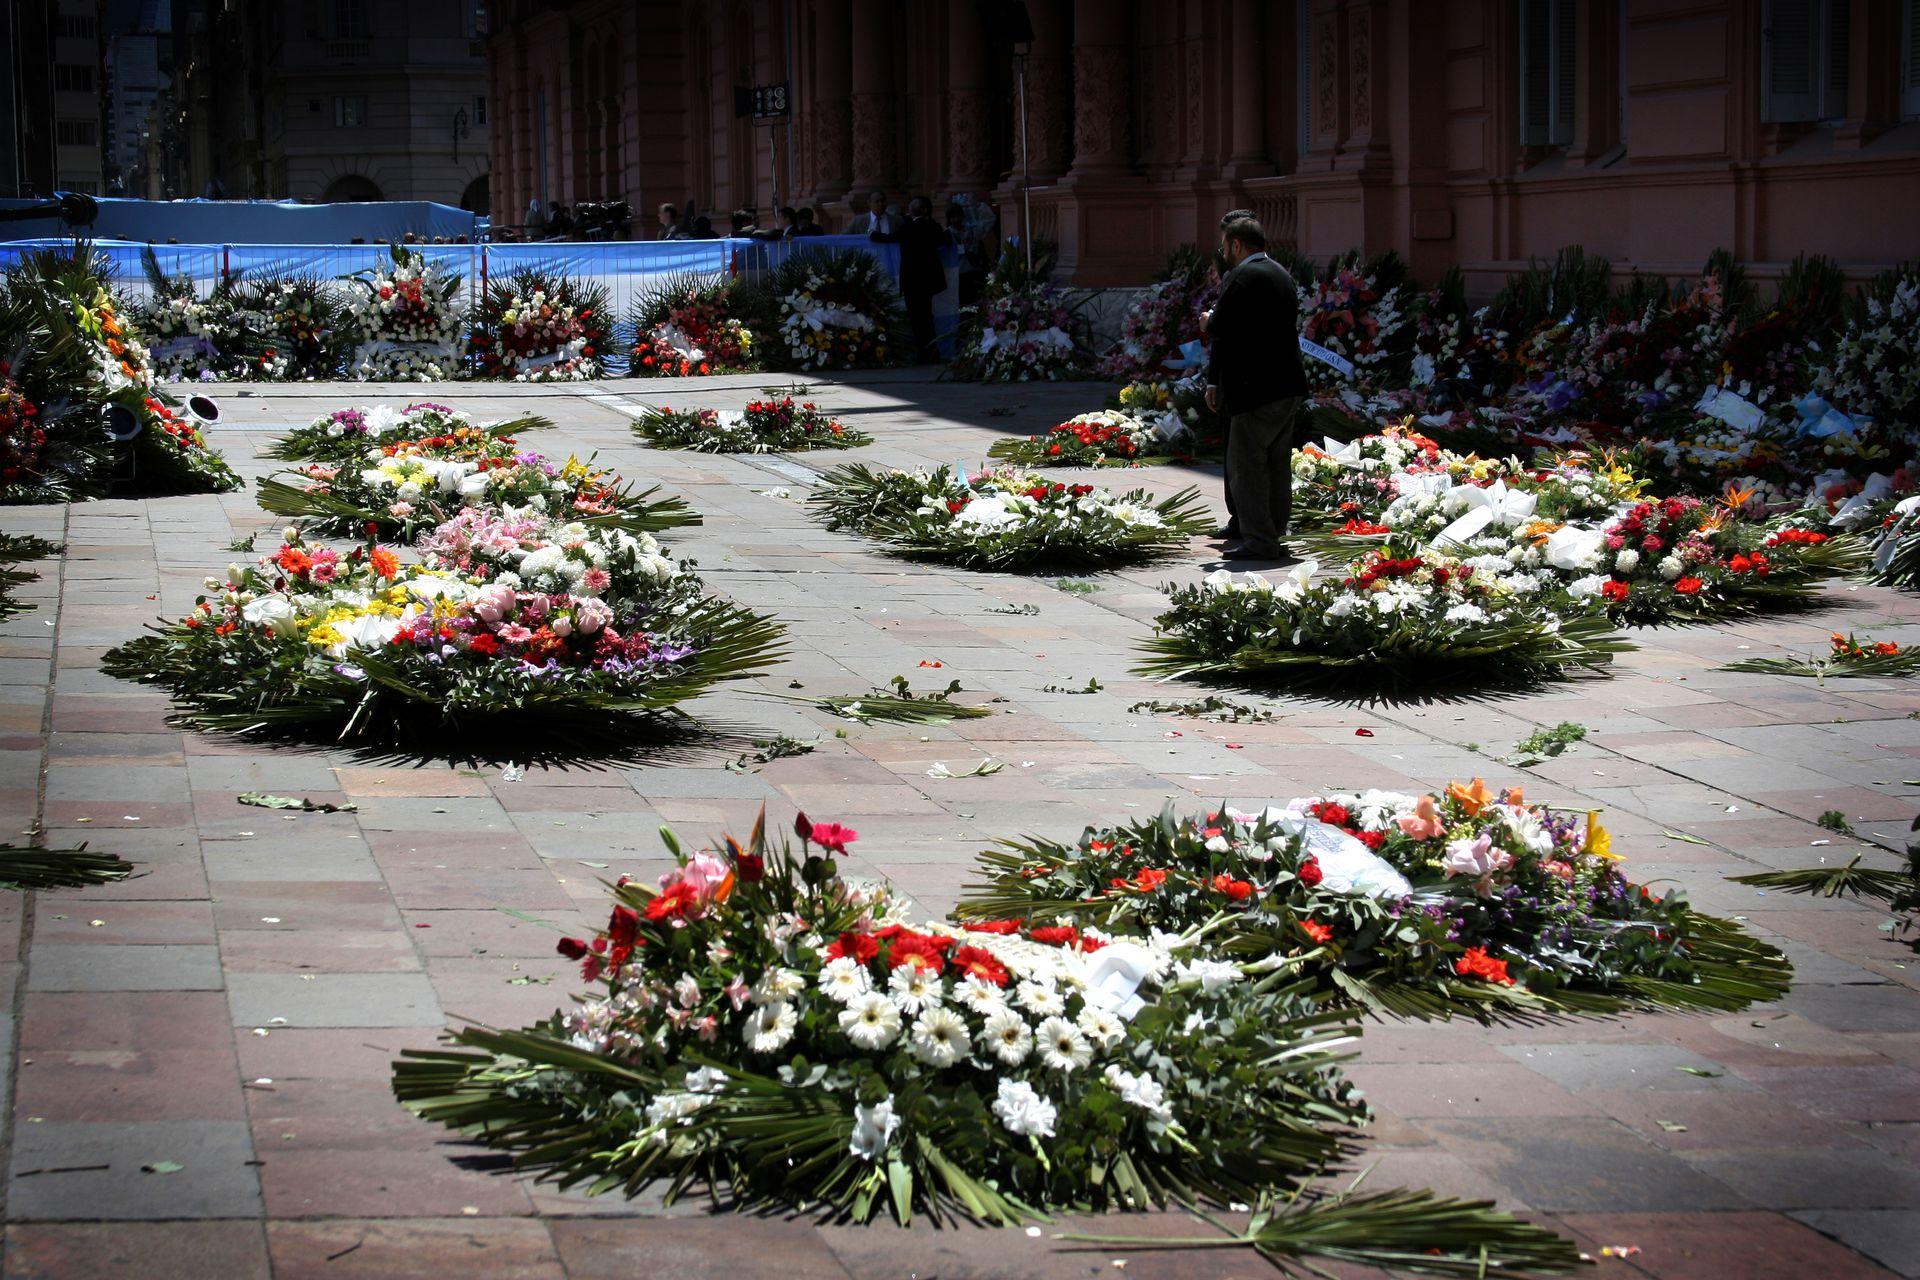 Coronas en la entrada de la Casa Rosada para despedir al expresidente Néstor Kirchner